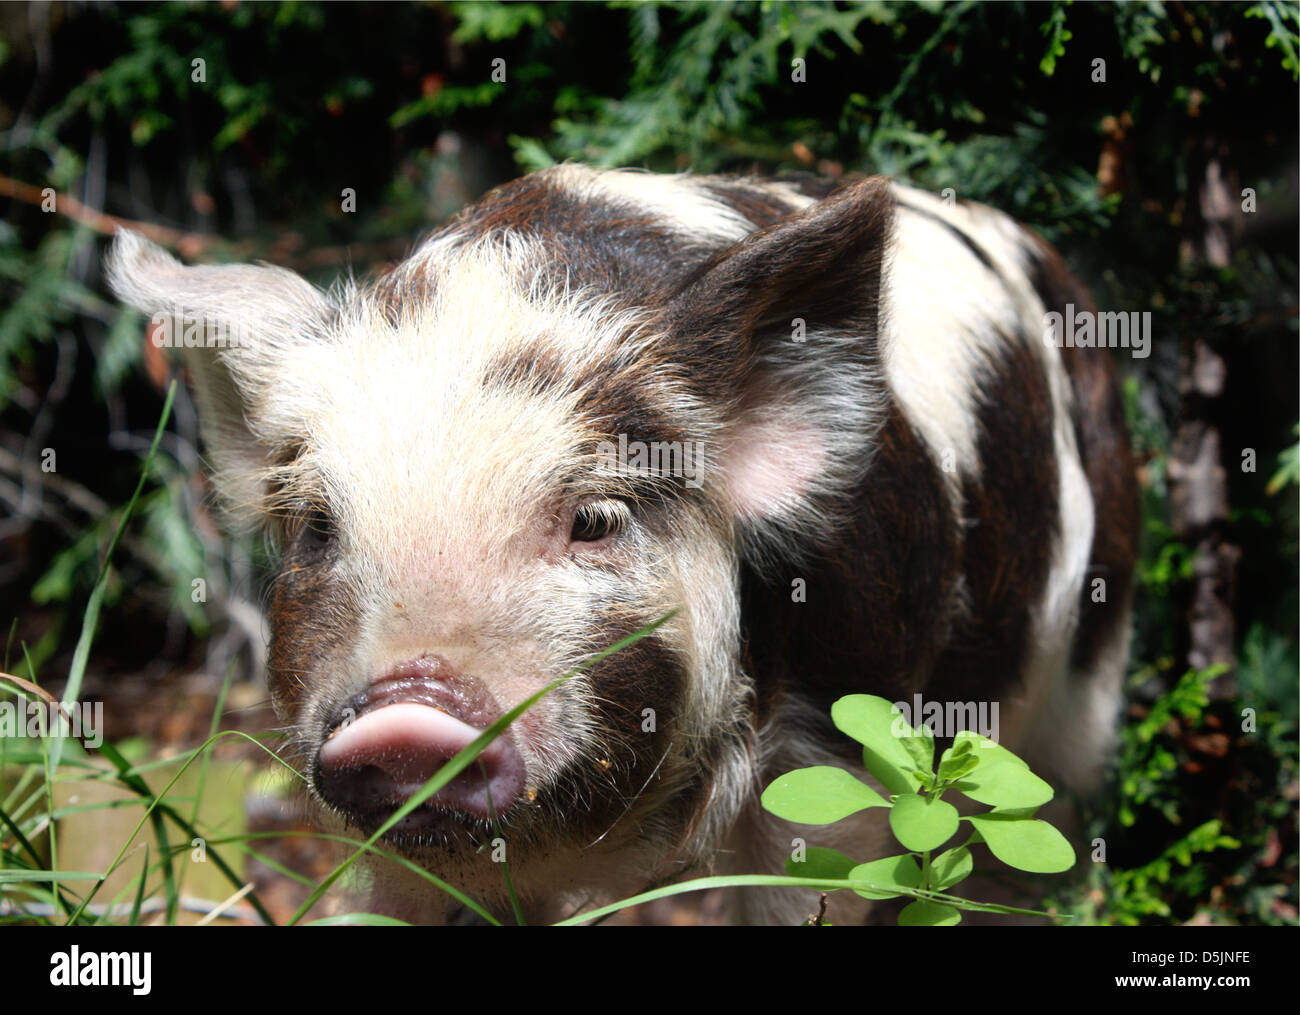 Hairy mature piglet